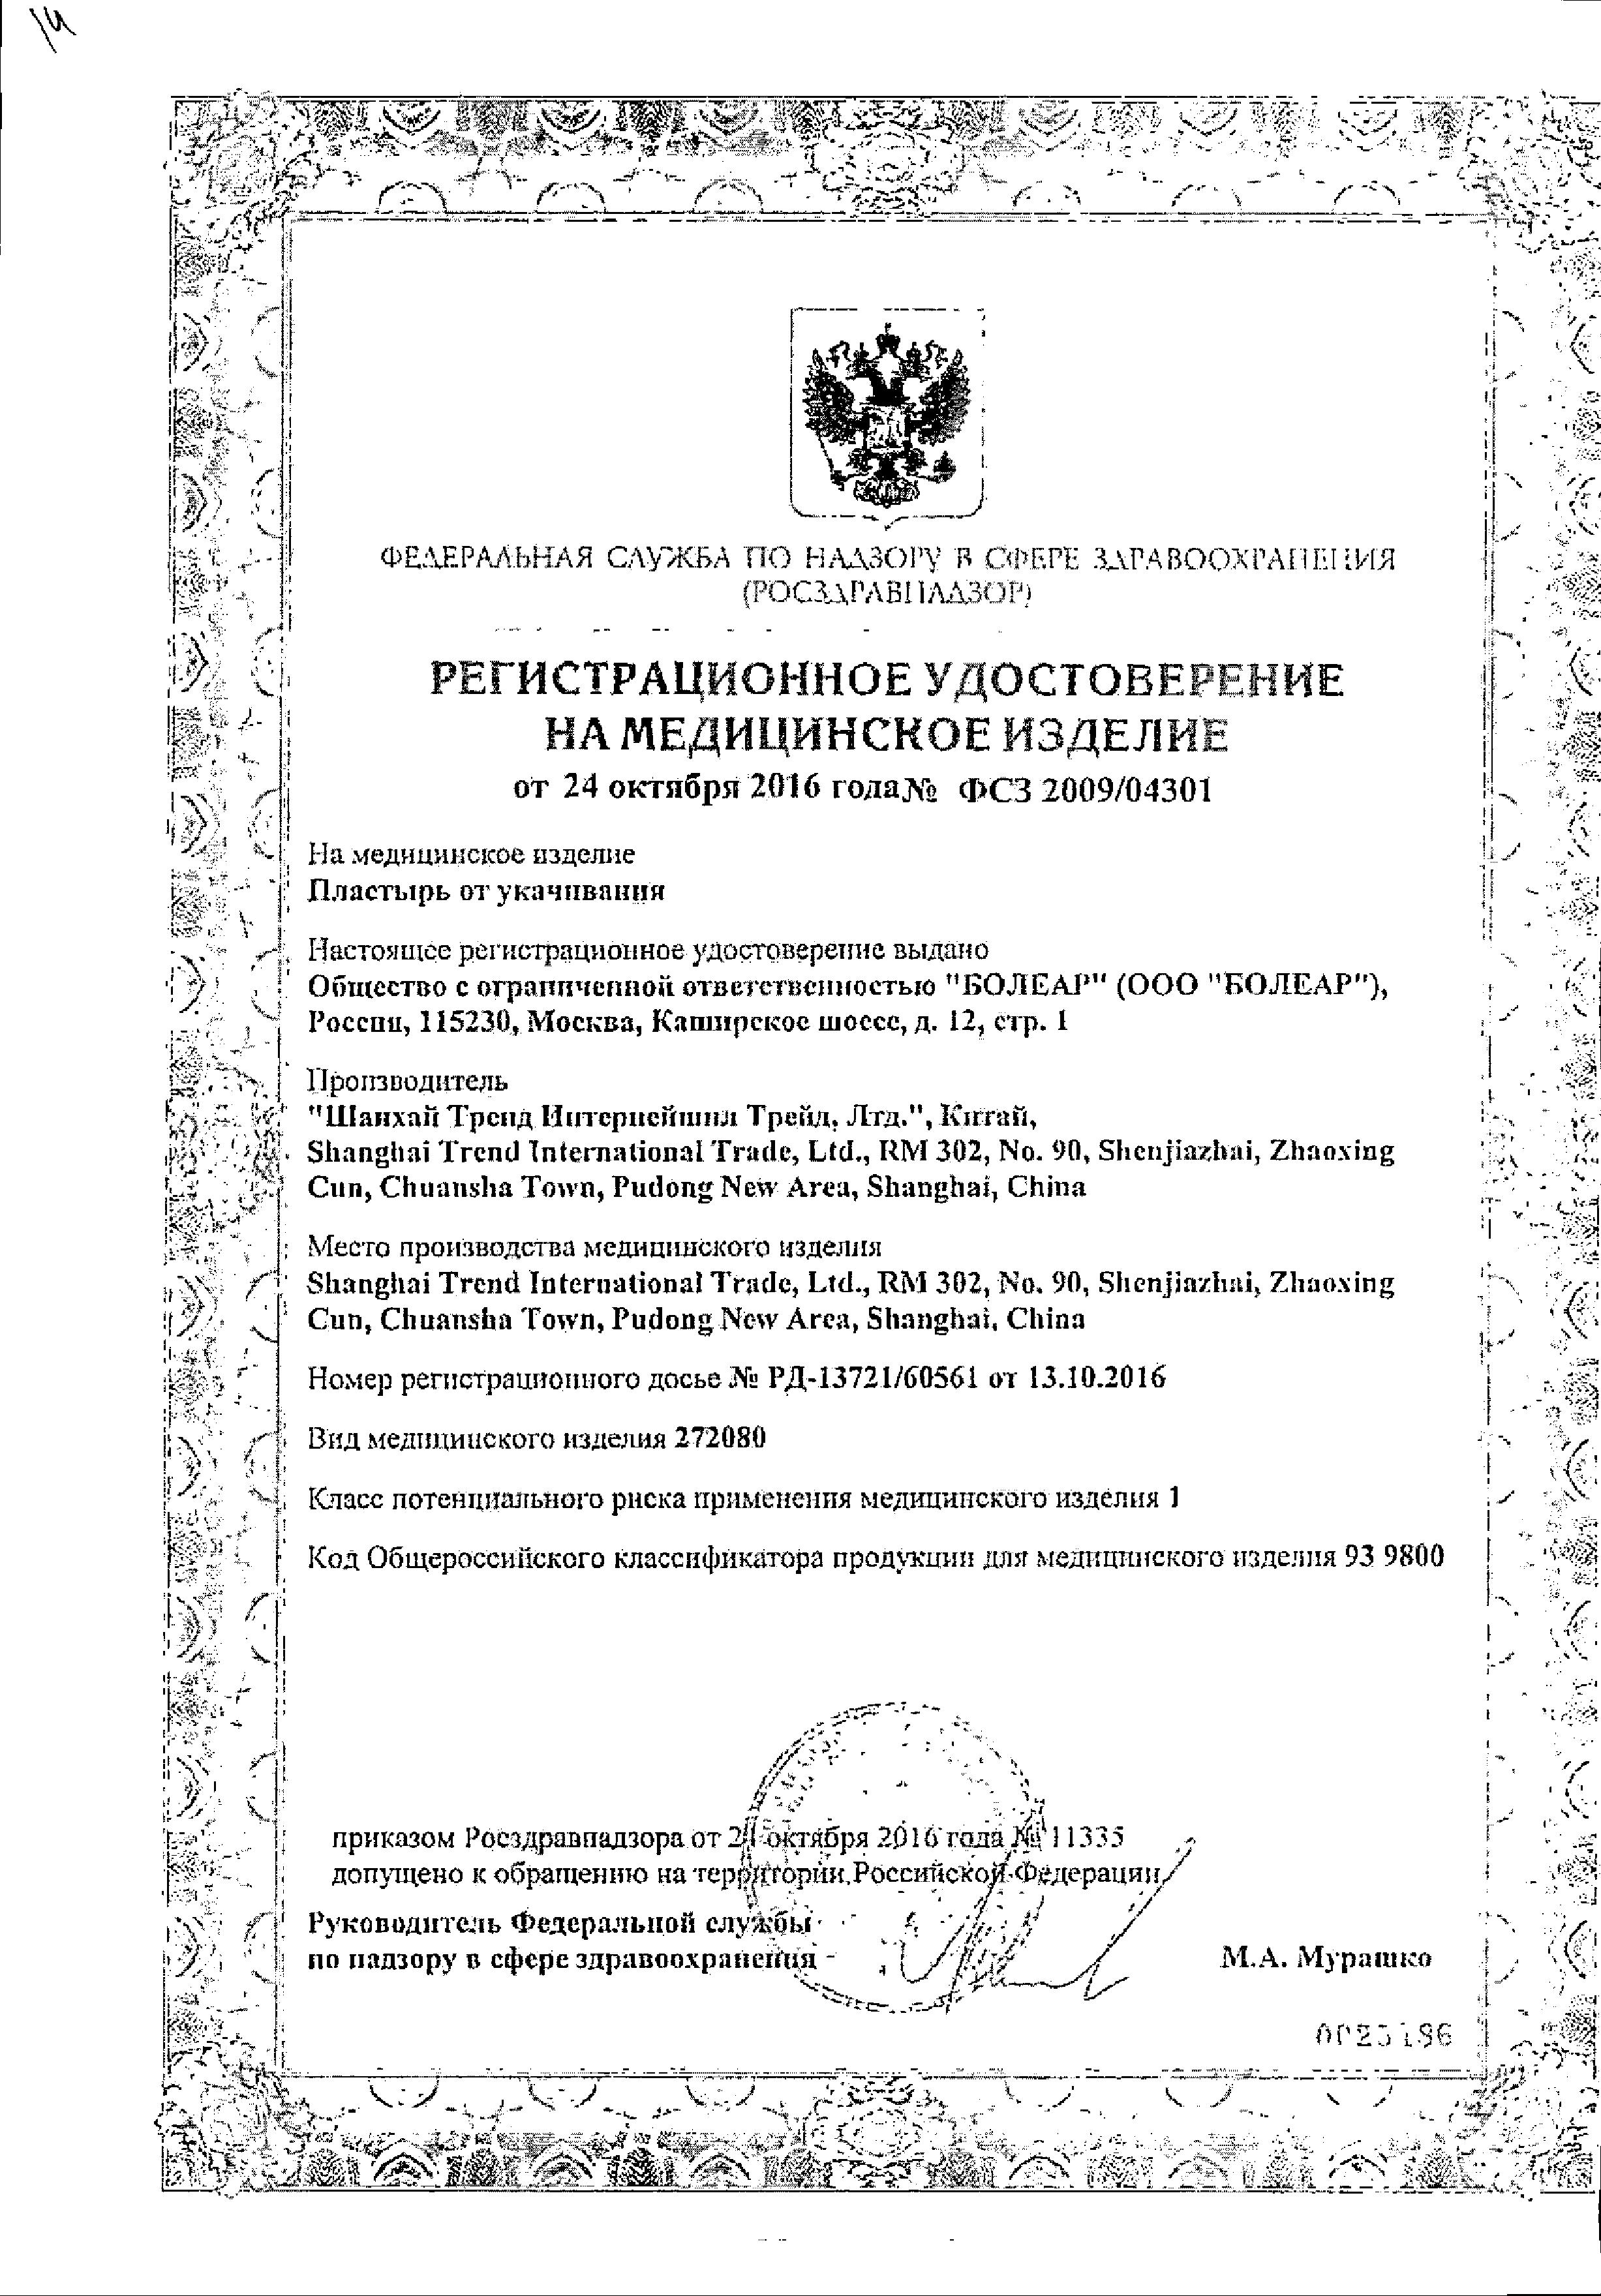 Extraplast Пластырь от укачивания сертификат